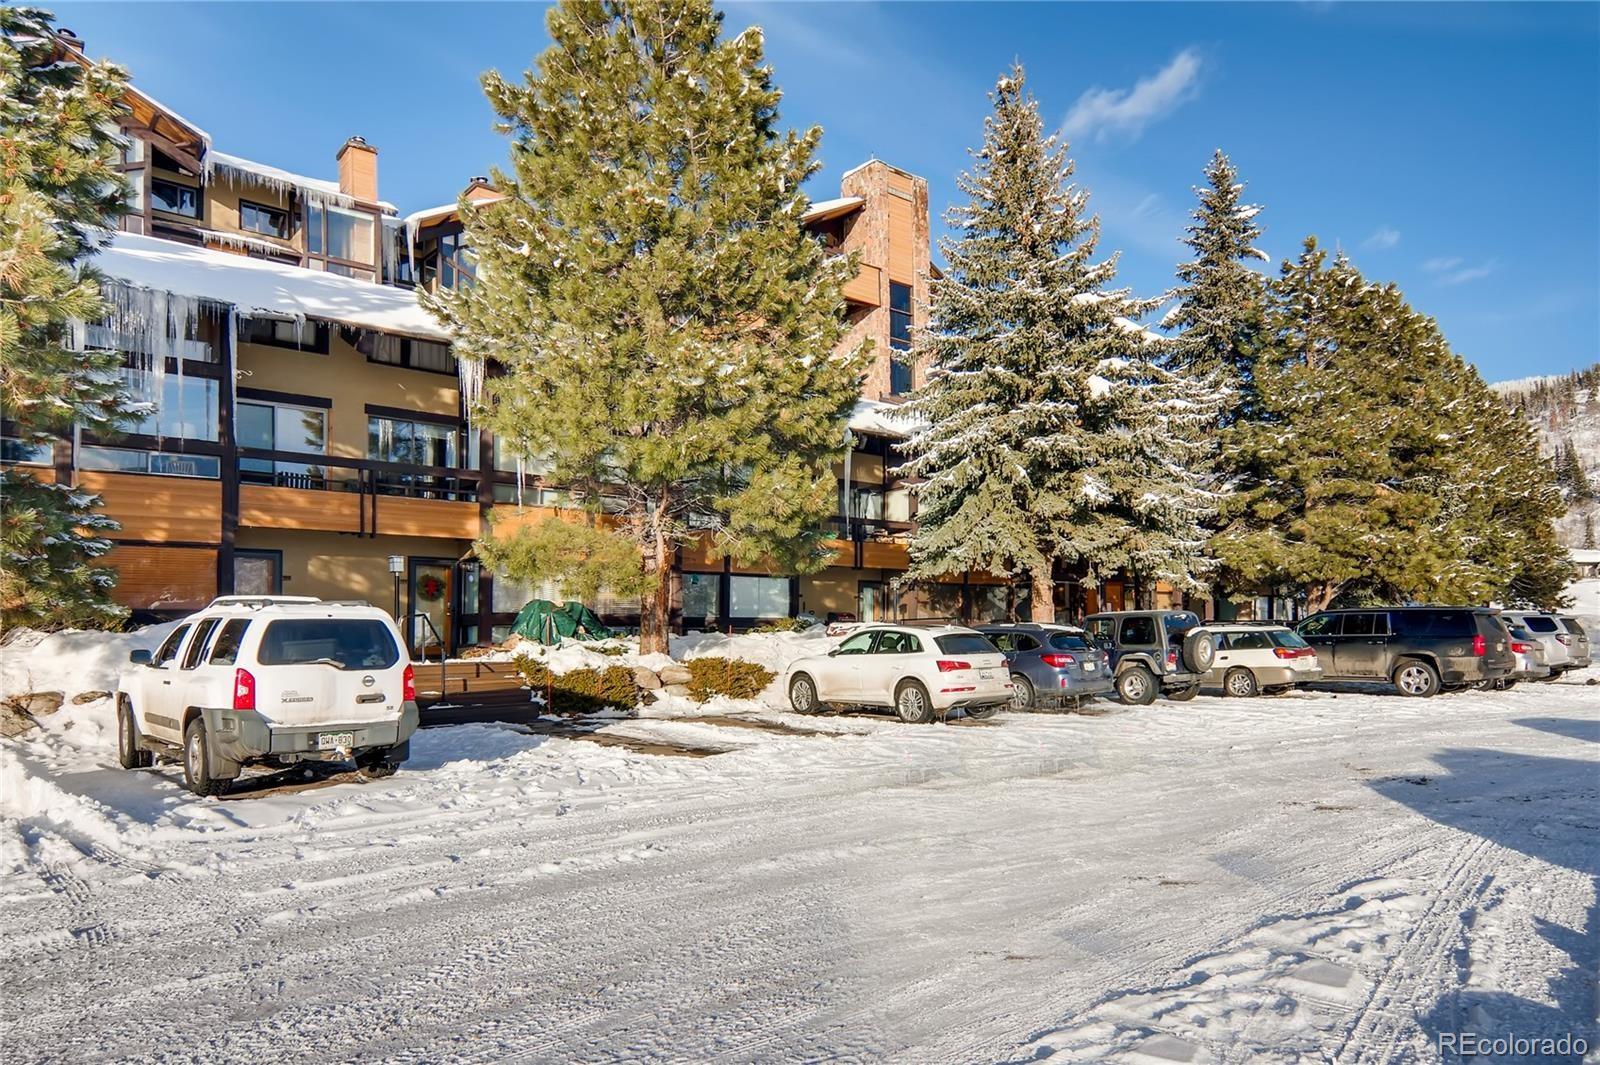 MLS# 8409447 - 20 - 31500 Runaway Place #209, Steamboat Springs, CO 80487